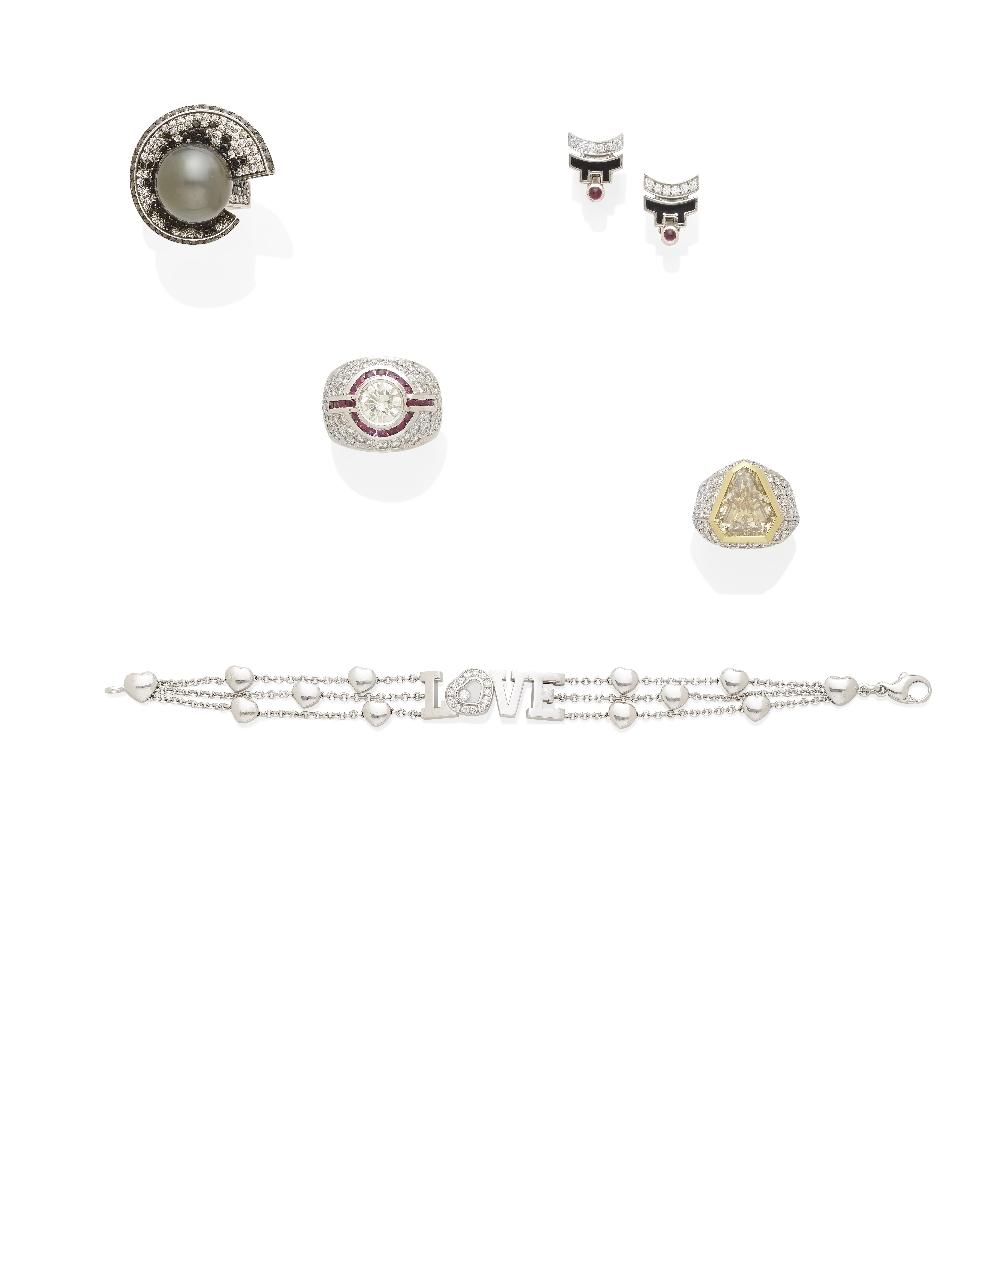 Lot 56 - A 'Happy Diamond' bracelet, Chopard